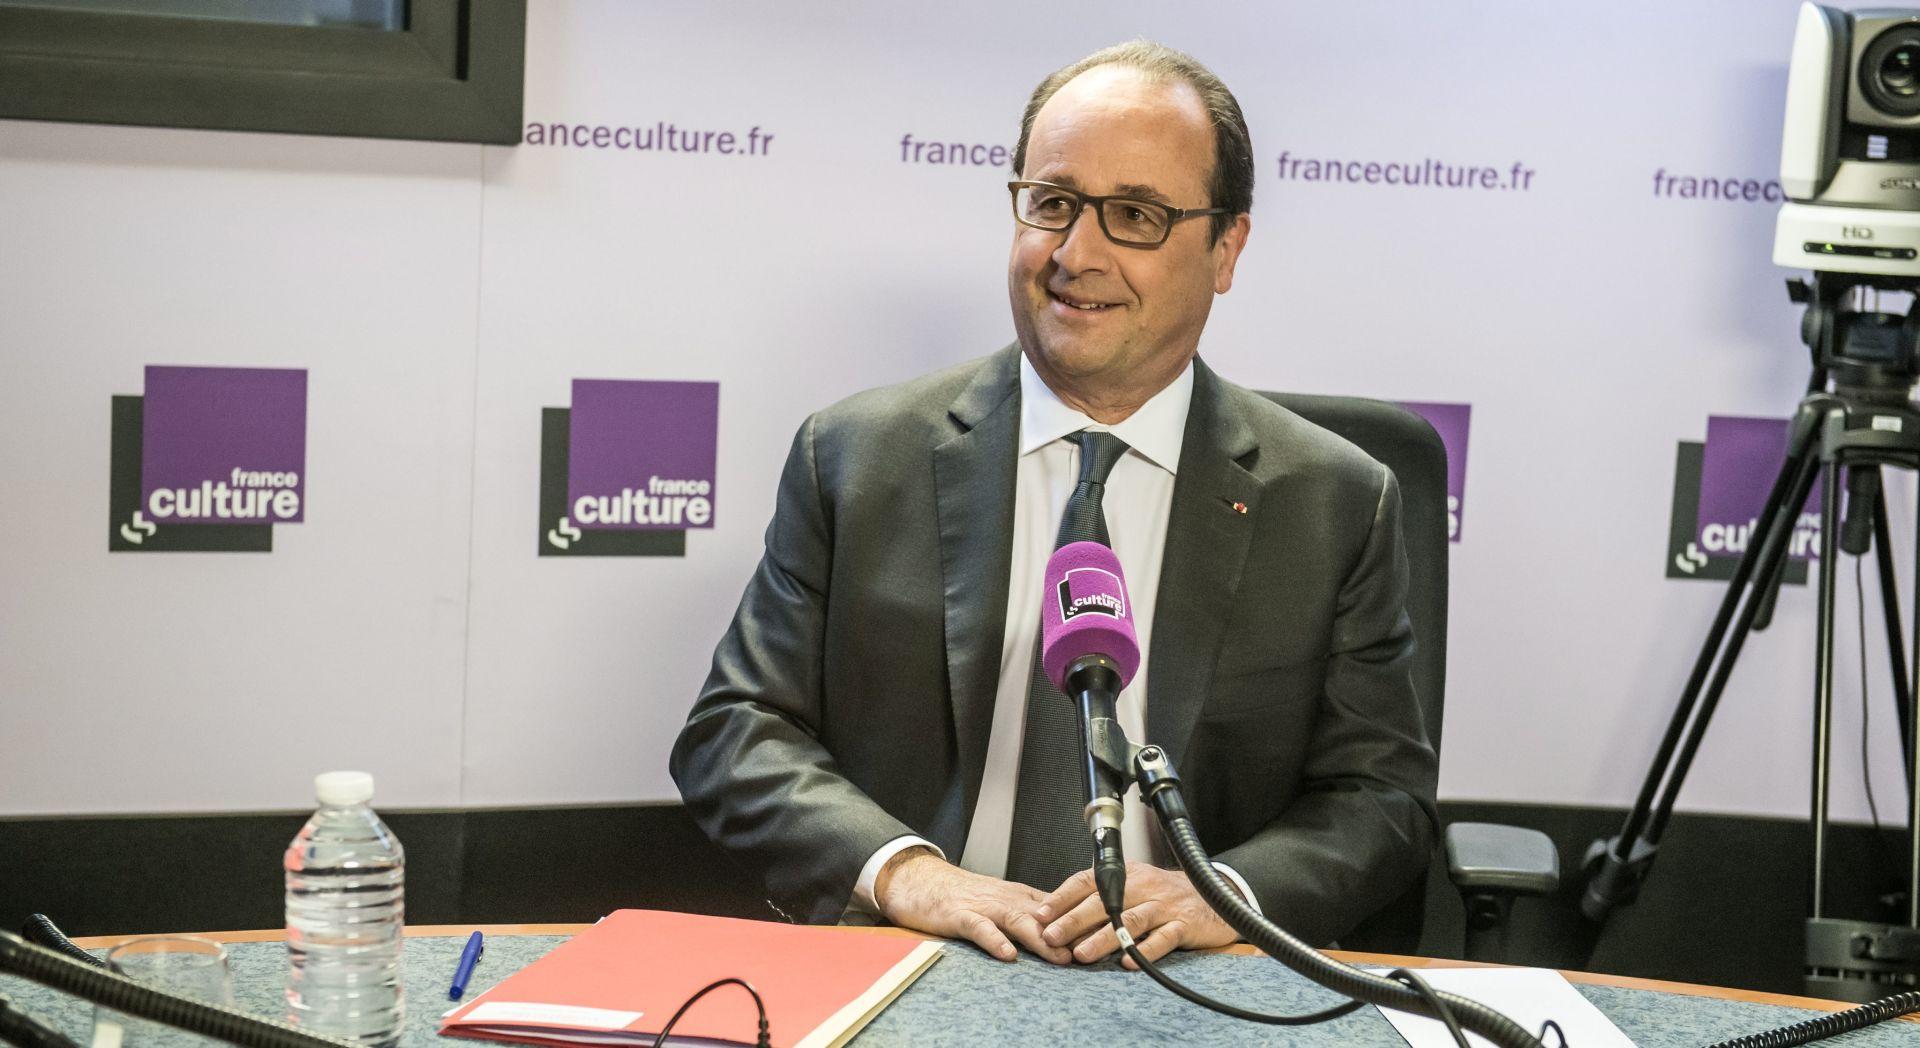 Hollande smatra kako Brexit ne bi smio ugroziti slobodno kretanje Europom